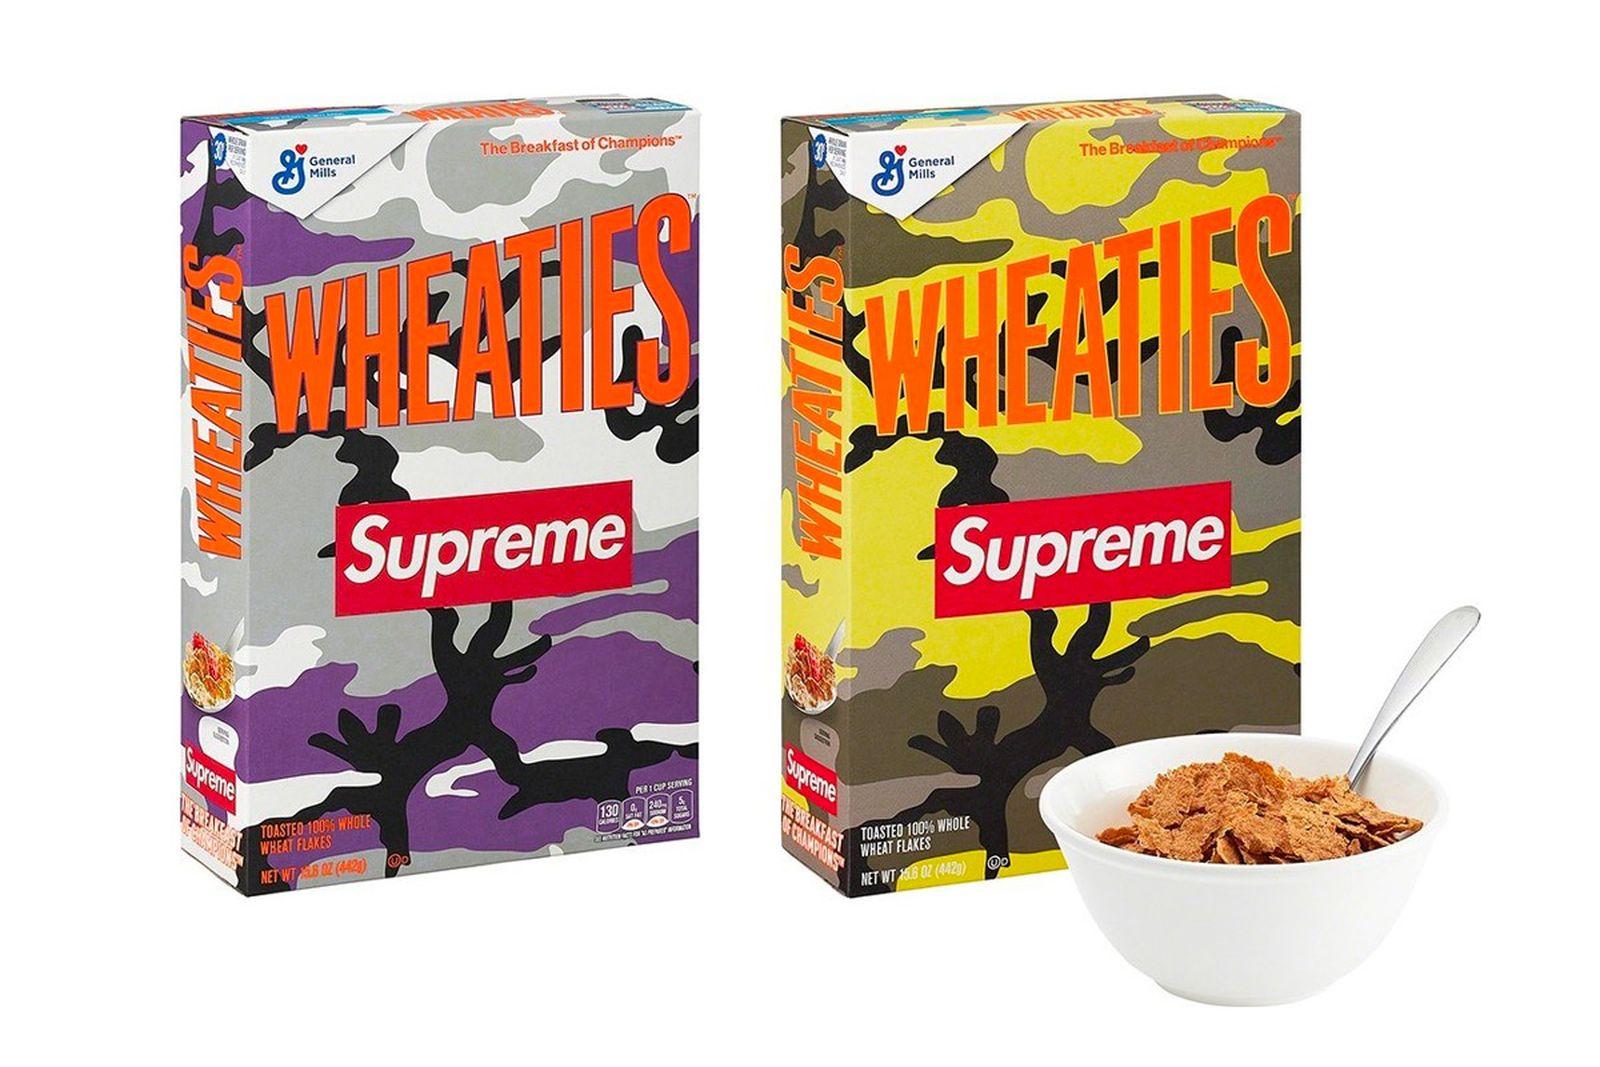 supreme-wheaties-main